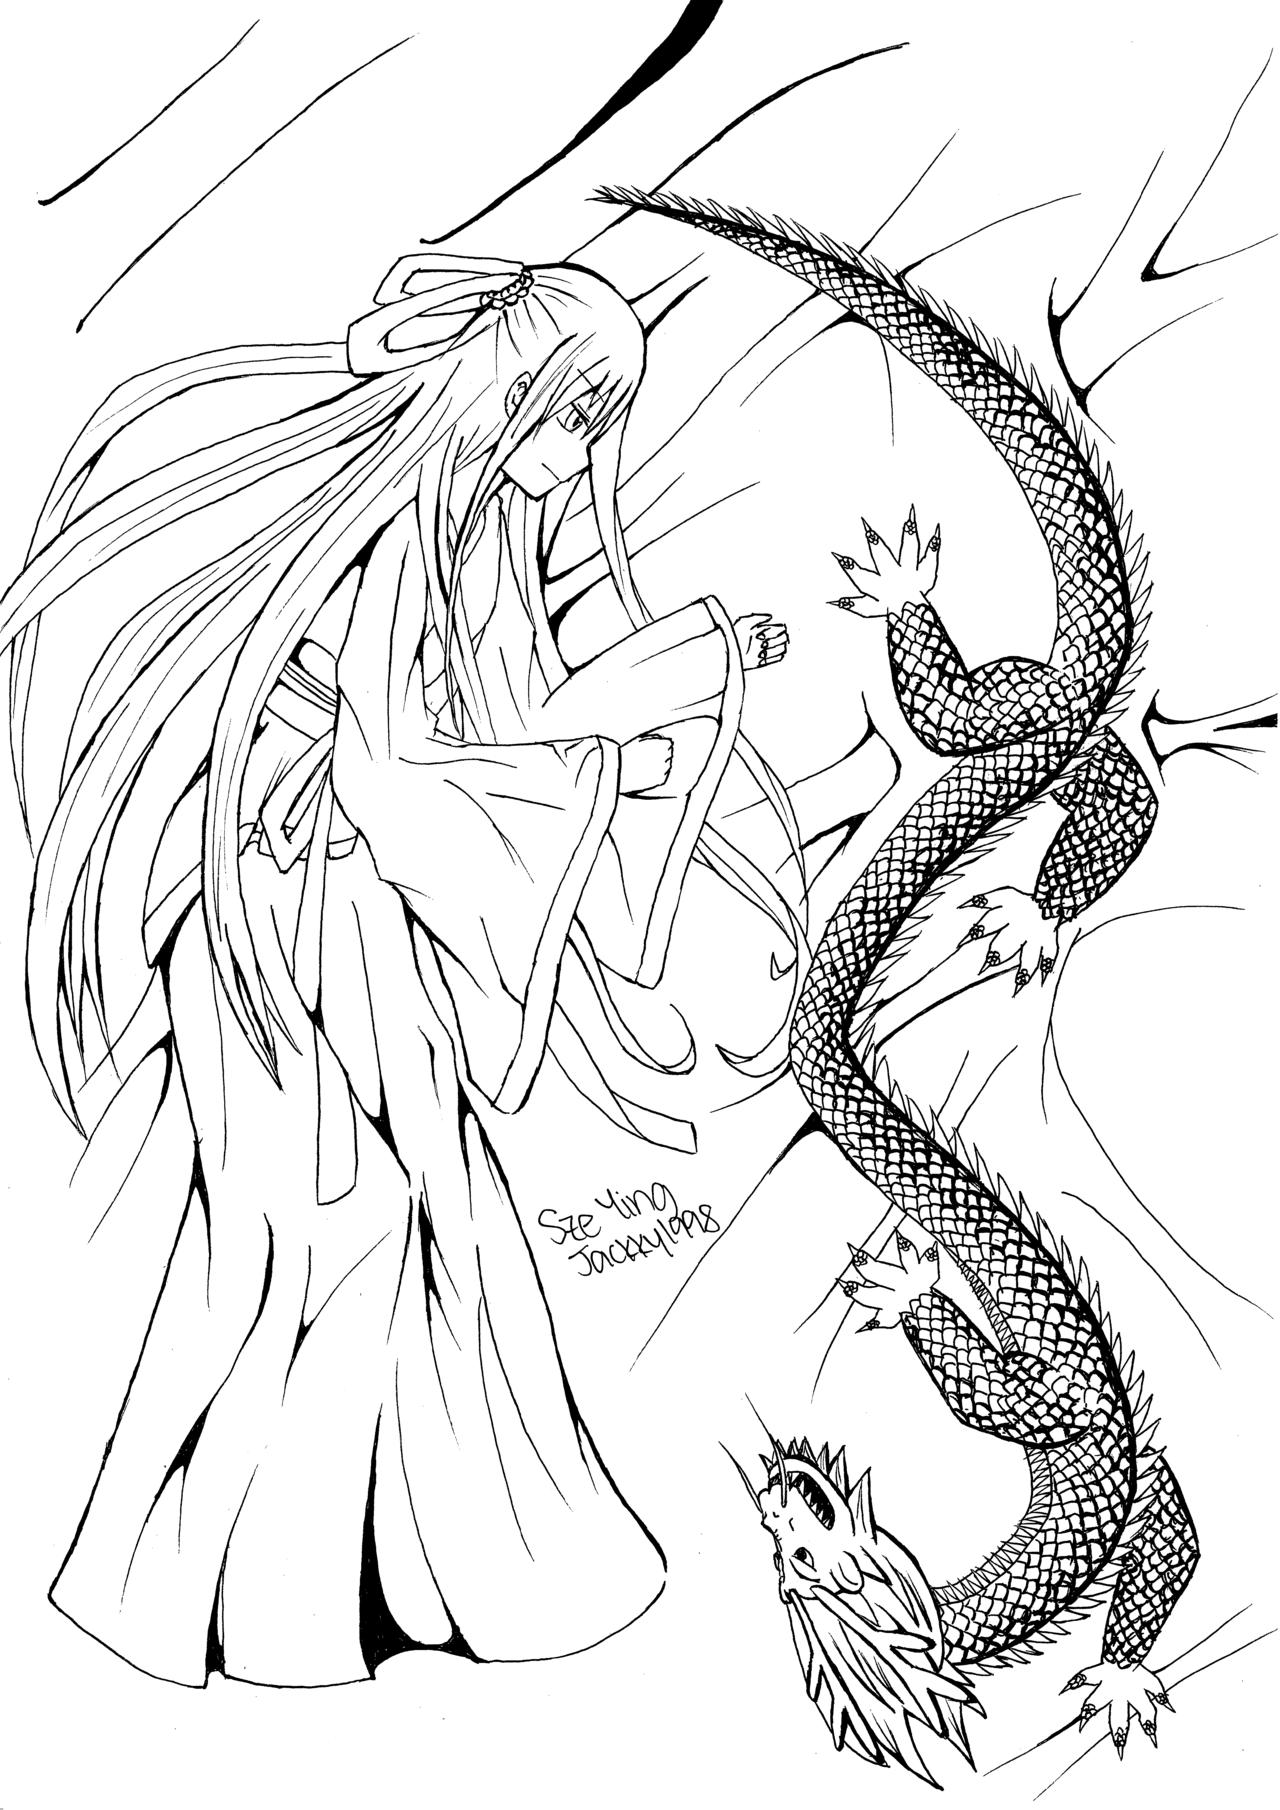 1280x1810 The Girl And The Dragon (Animemanga Line Art) By Aoi Kanou